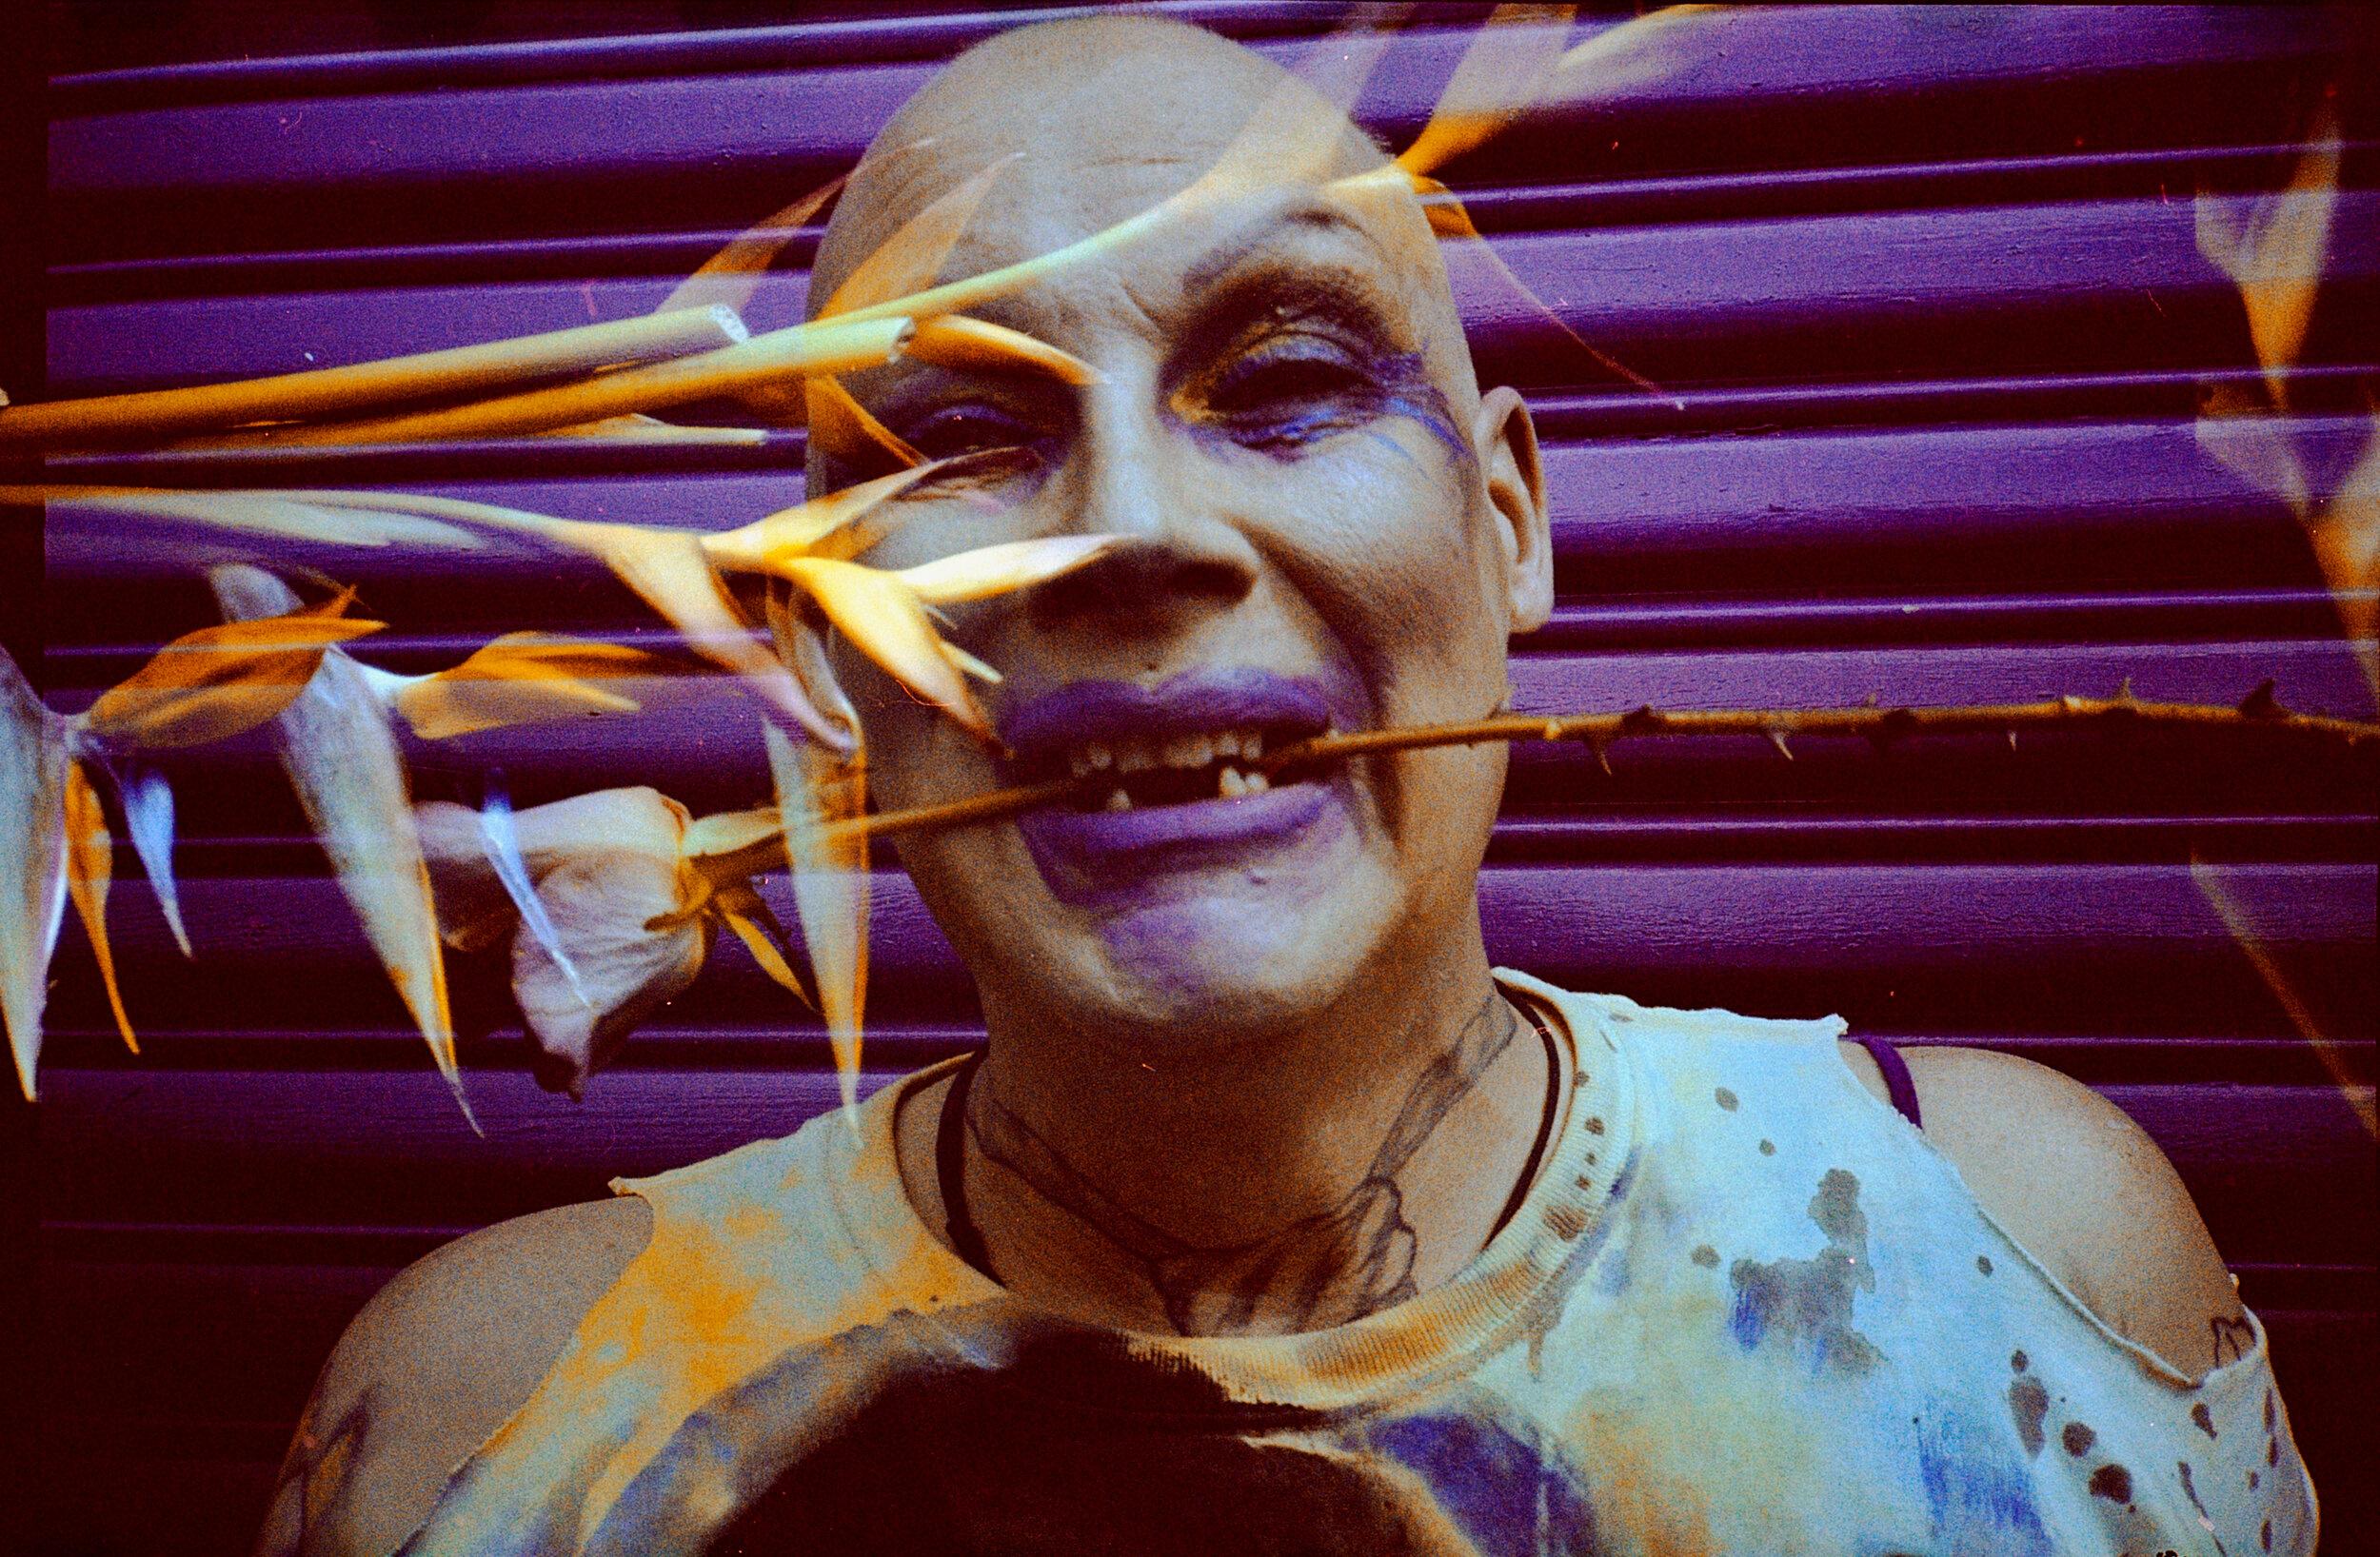 San Francisco Drag Legend, Phatima Rude